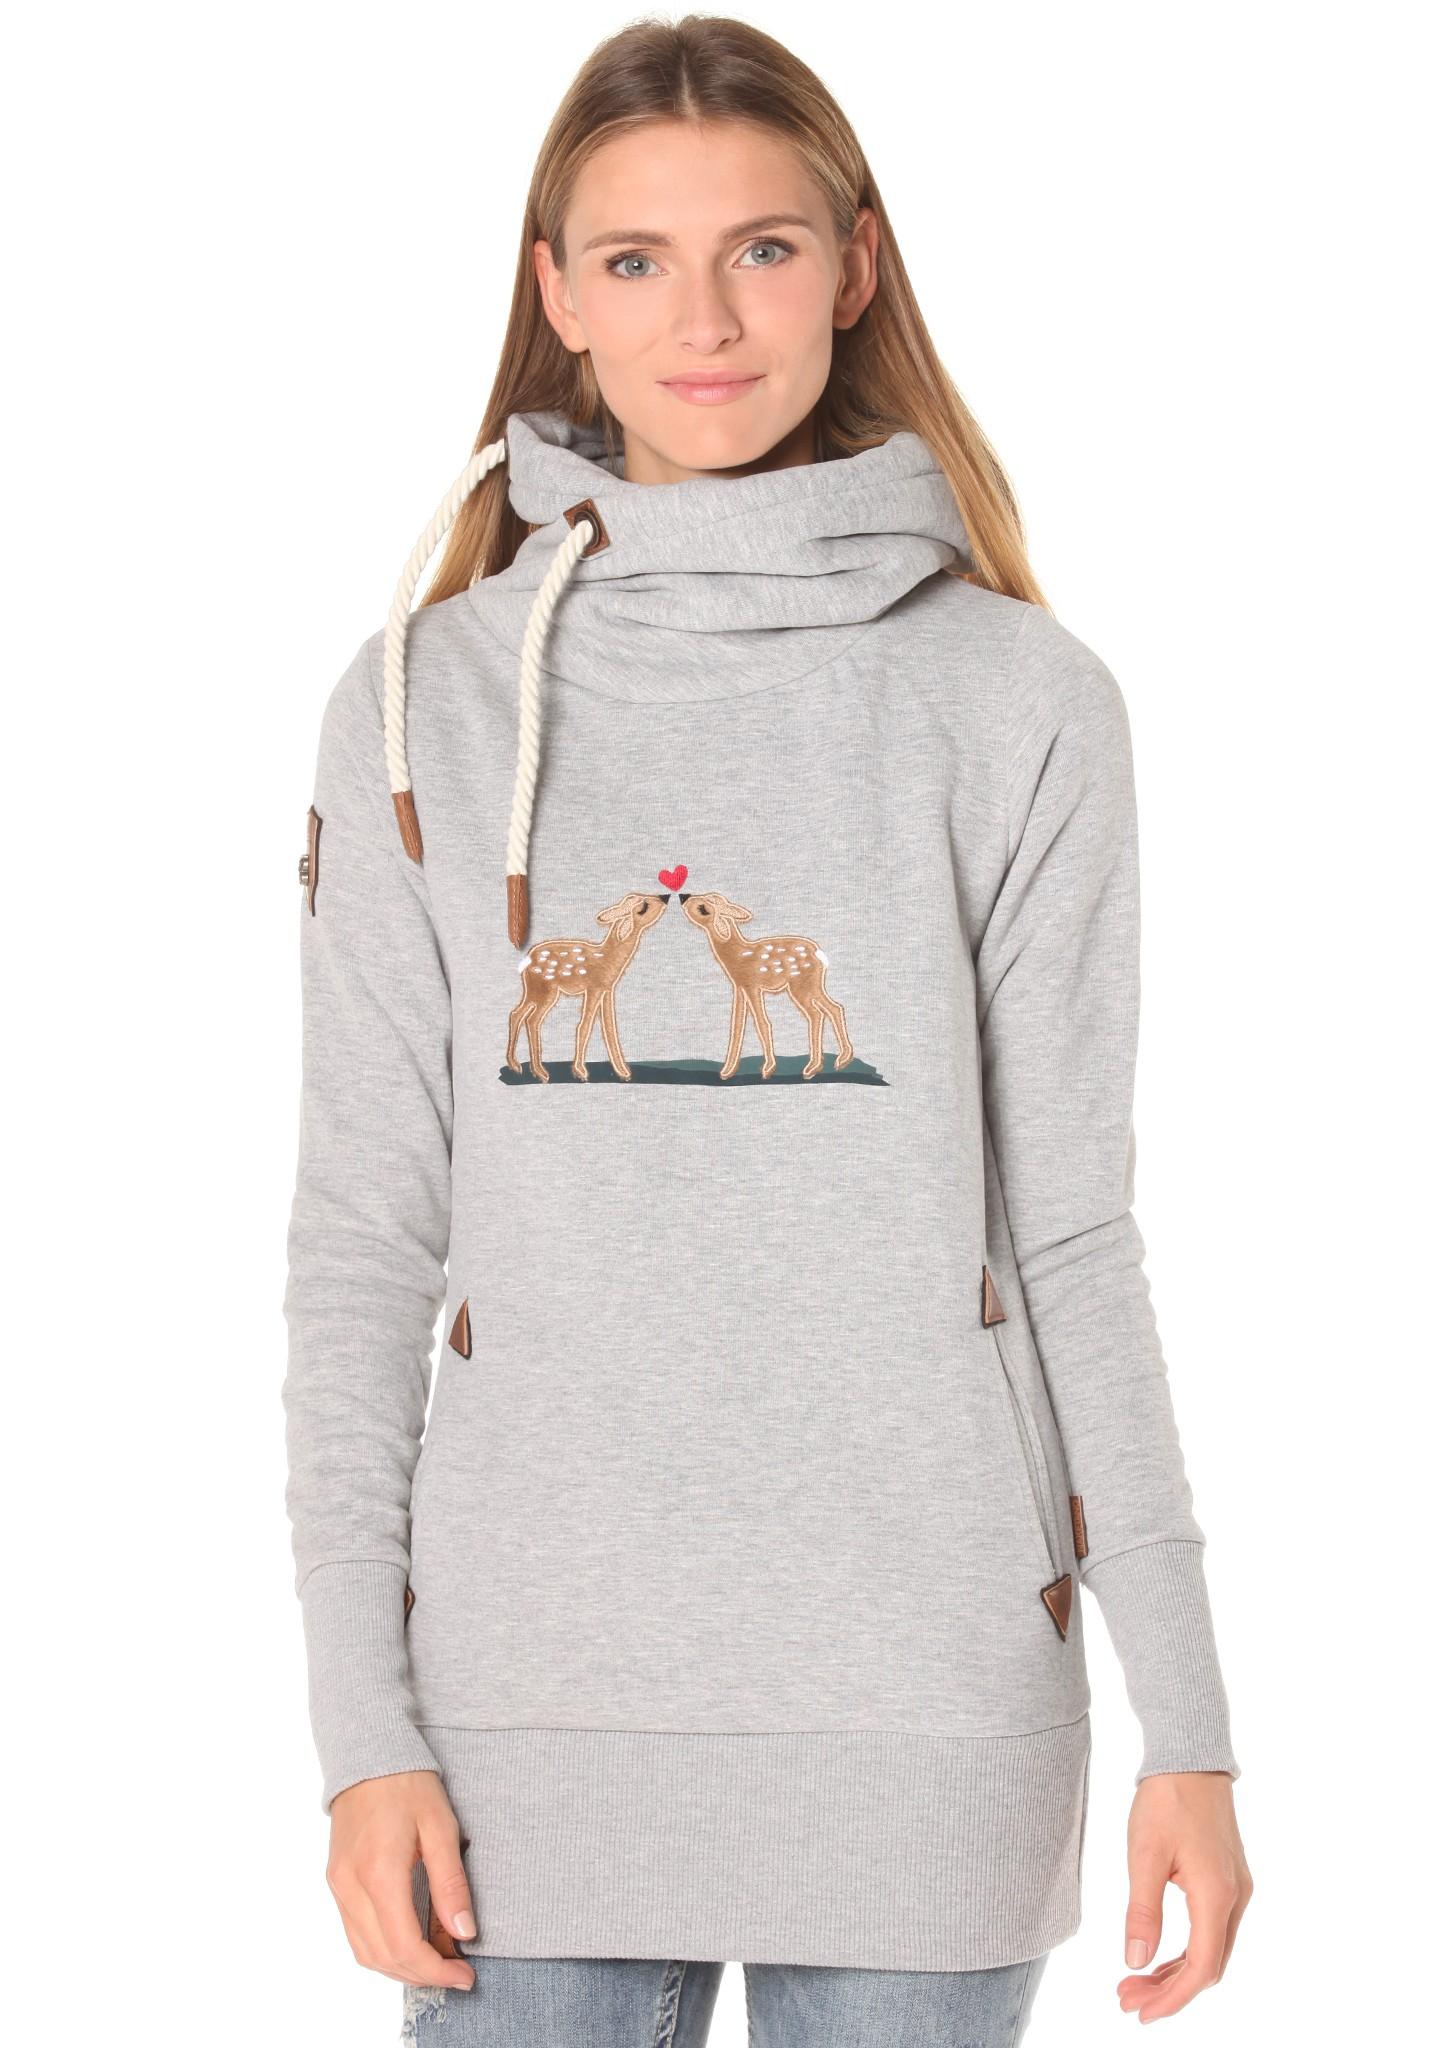 neu naketano frotzelinchen xxi damen kapuzenpullover pullover hoodie ebay. Black Bedroom Furniture Sets. Home Design Ideas